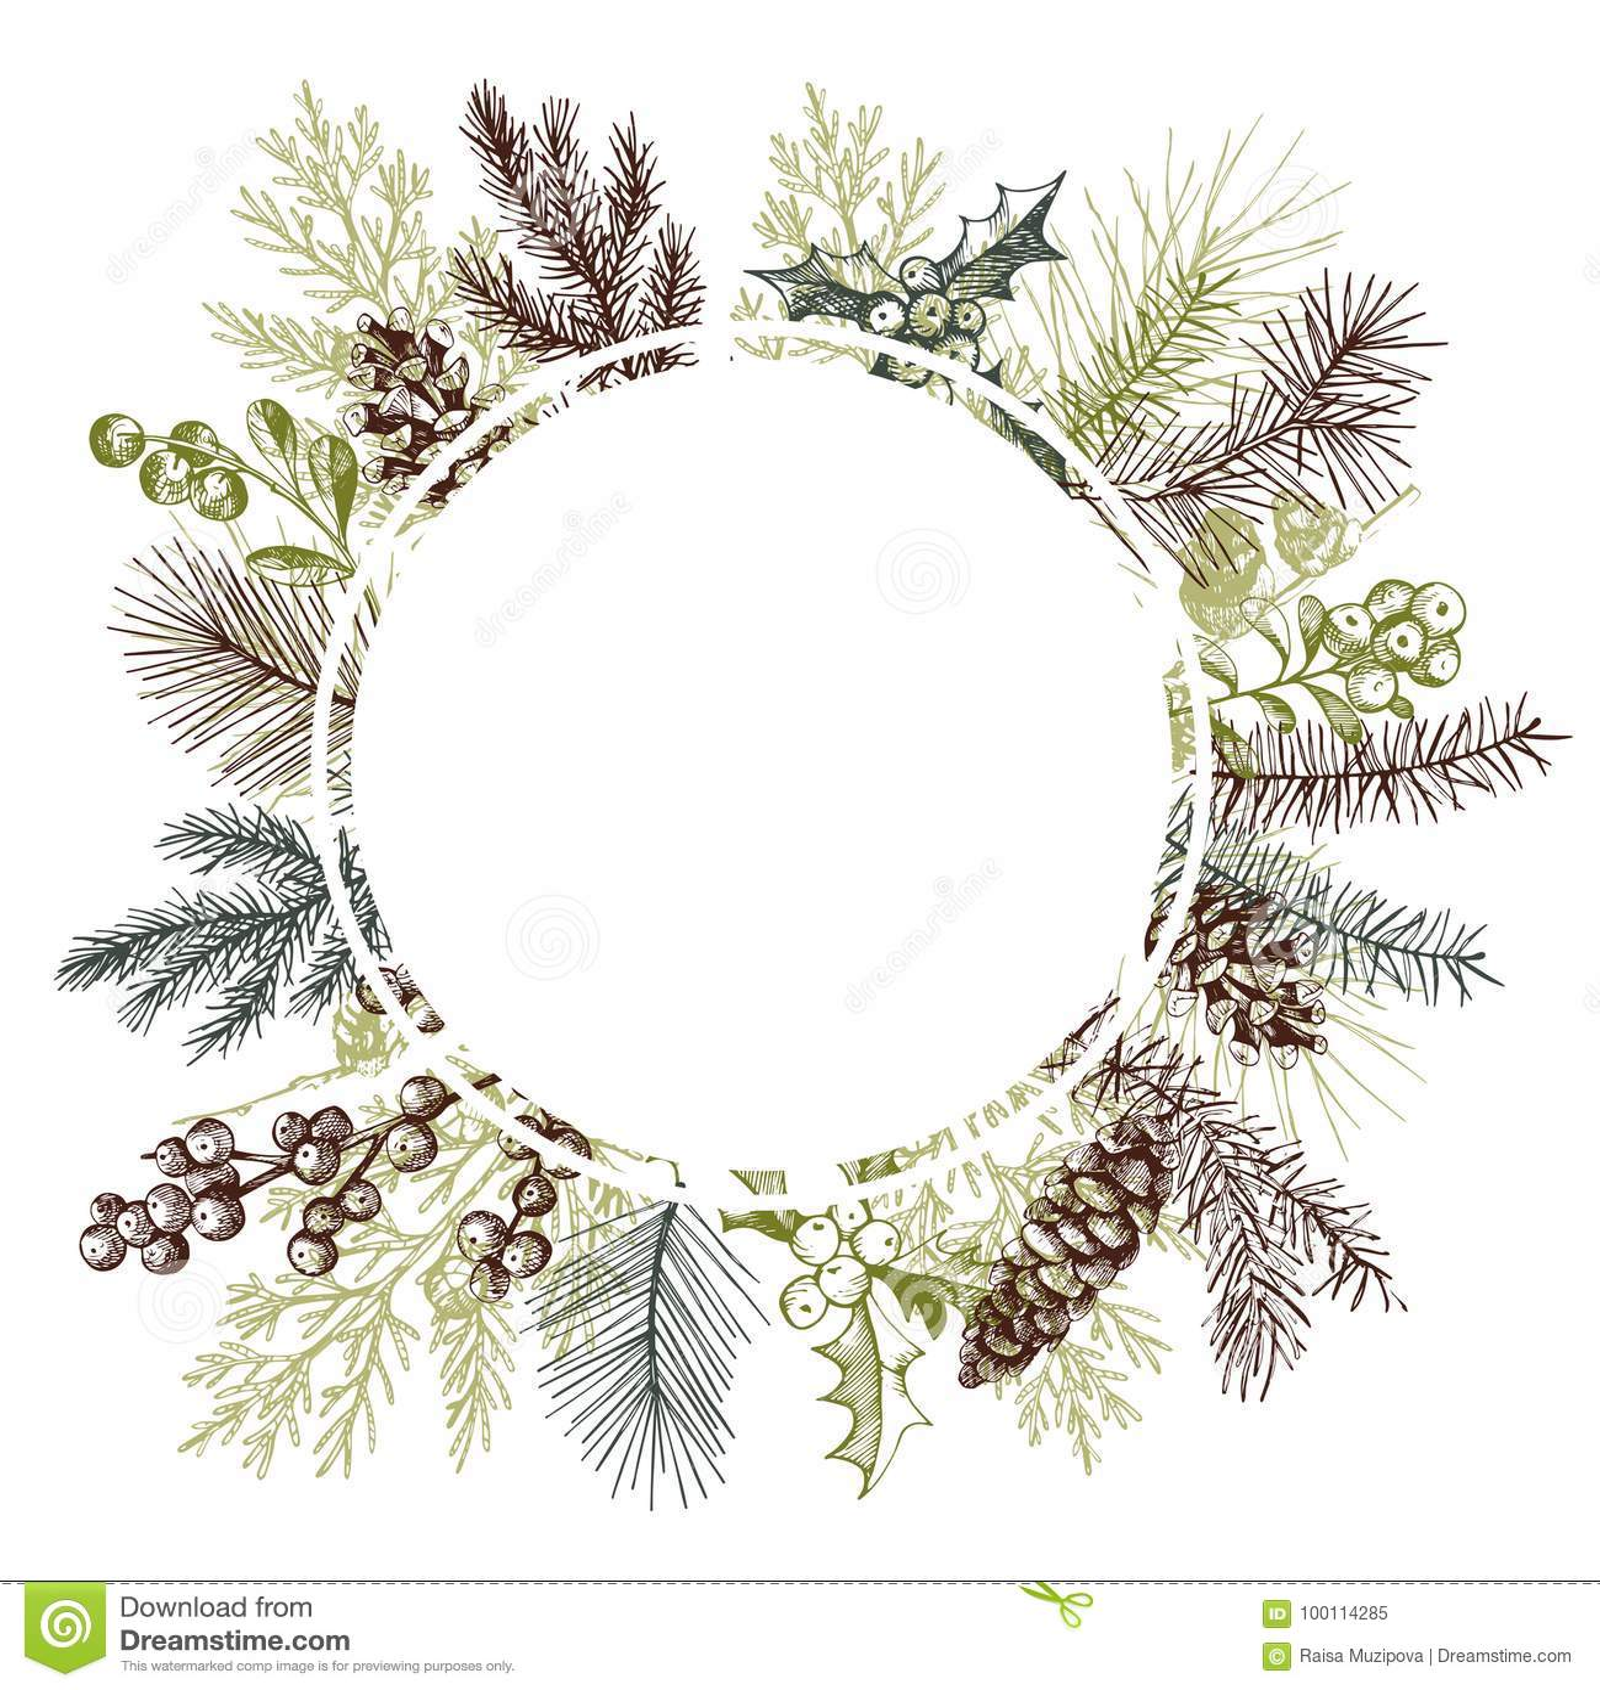 Vector frame with hand drawn Christmas plants